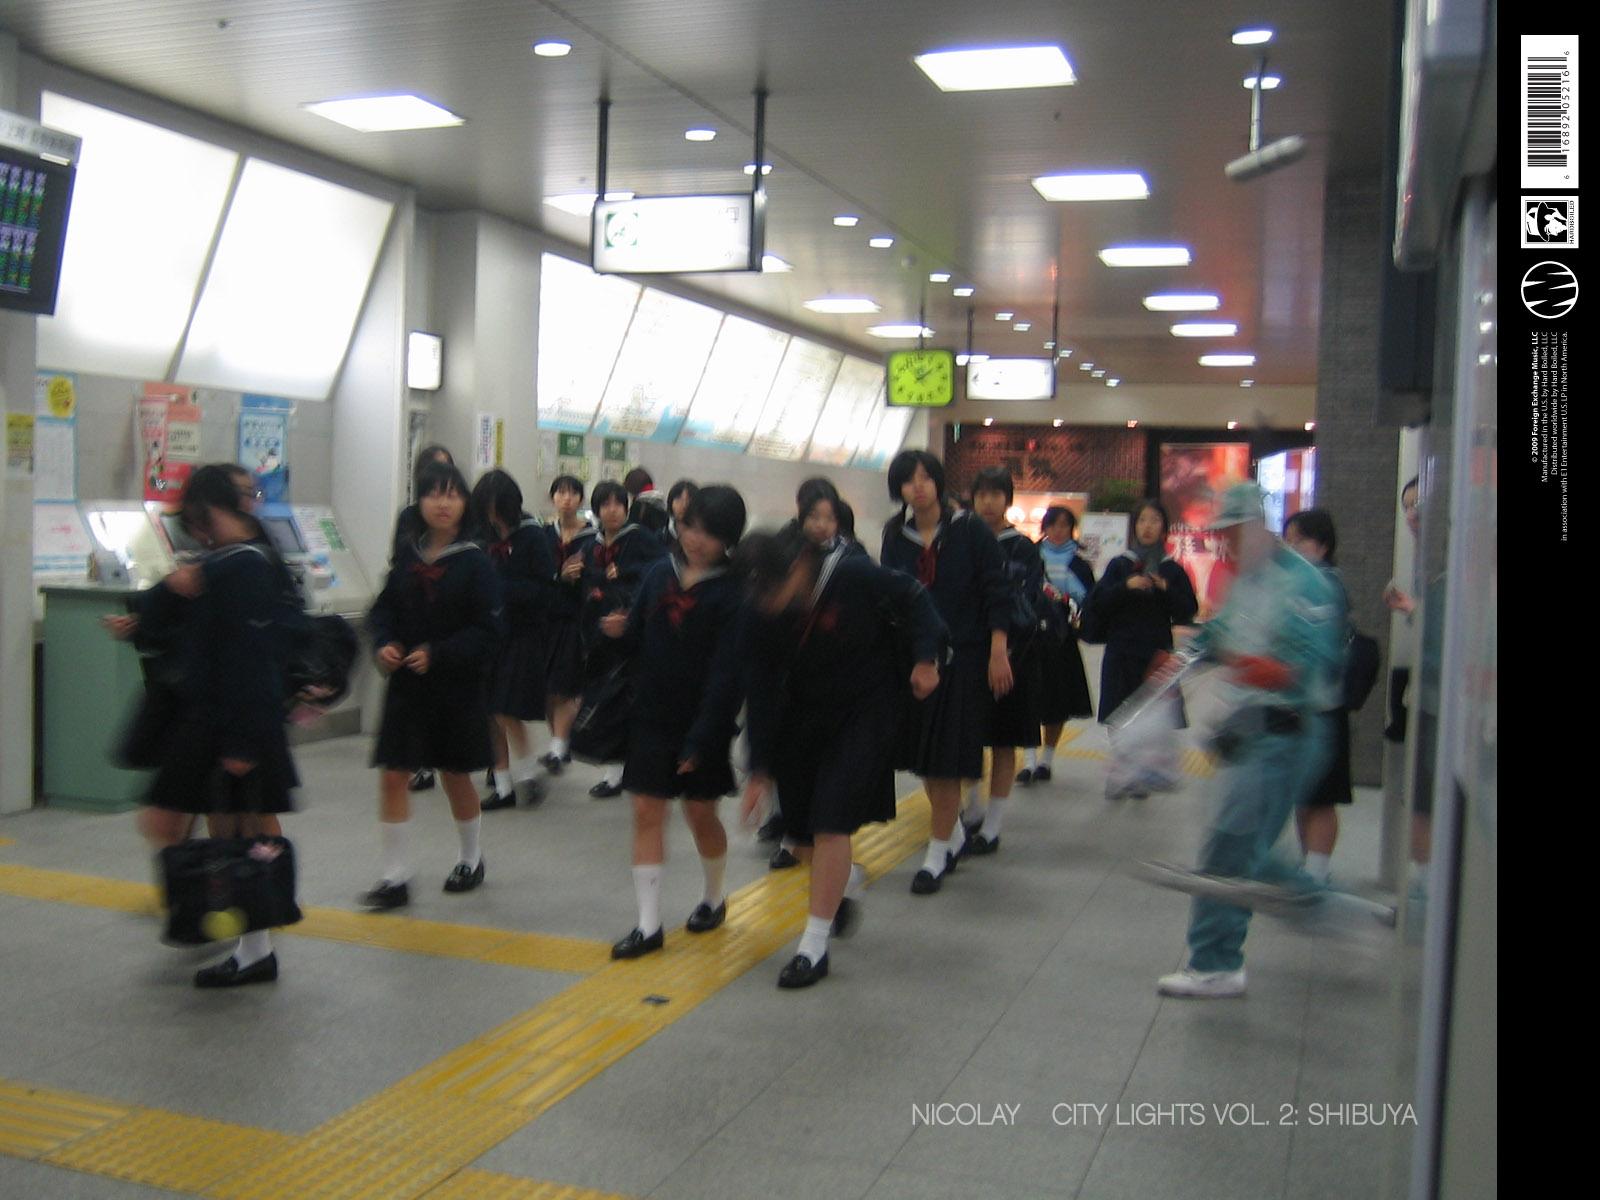 city lights vol. 2: shibuya wallpapers